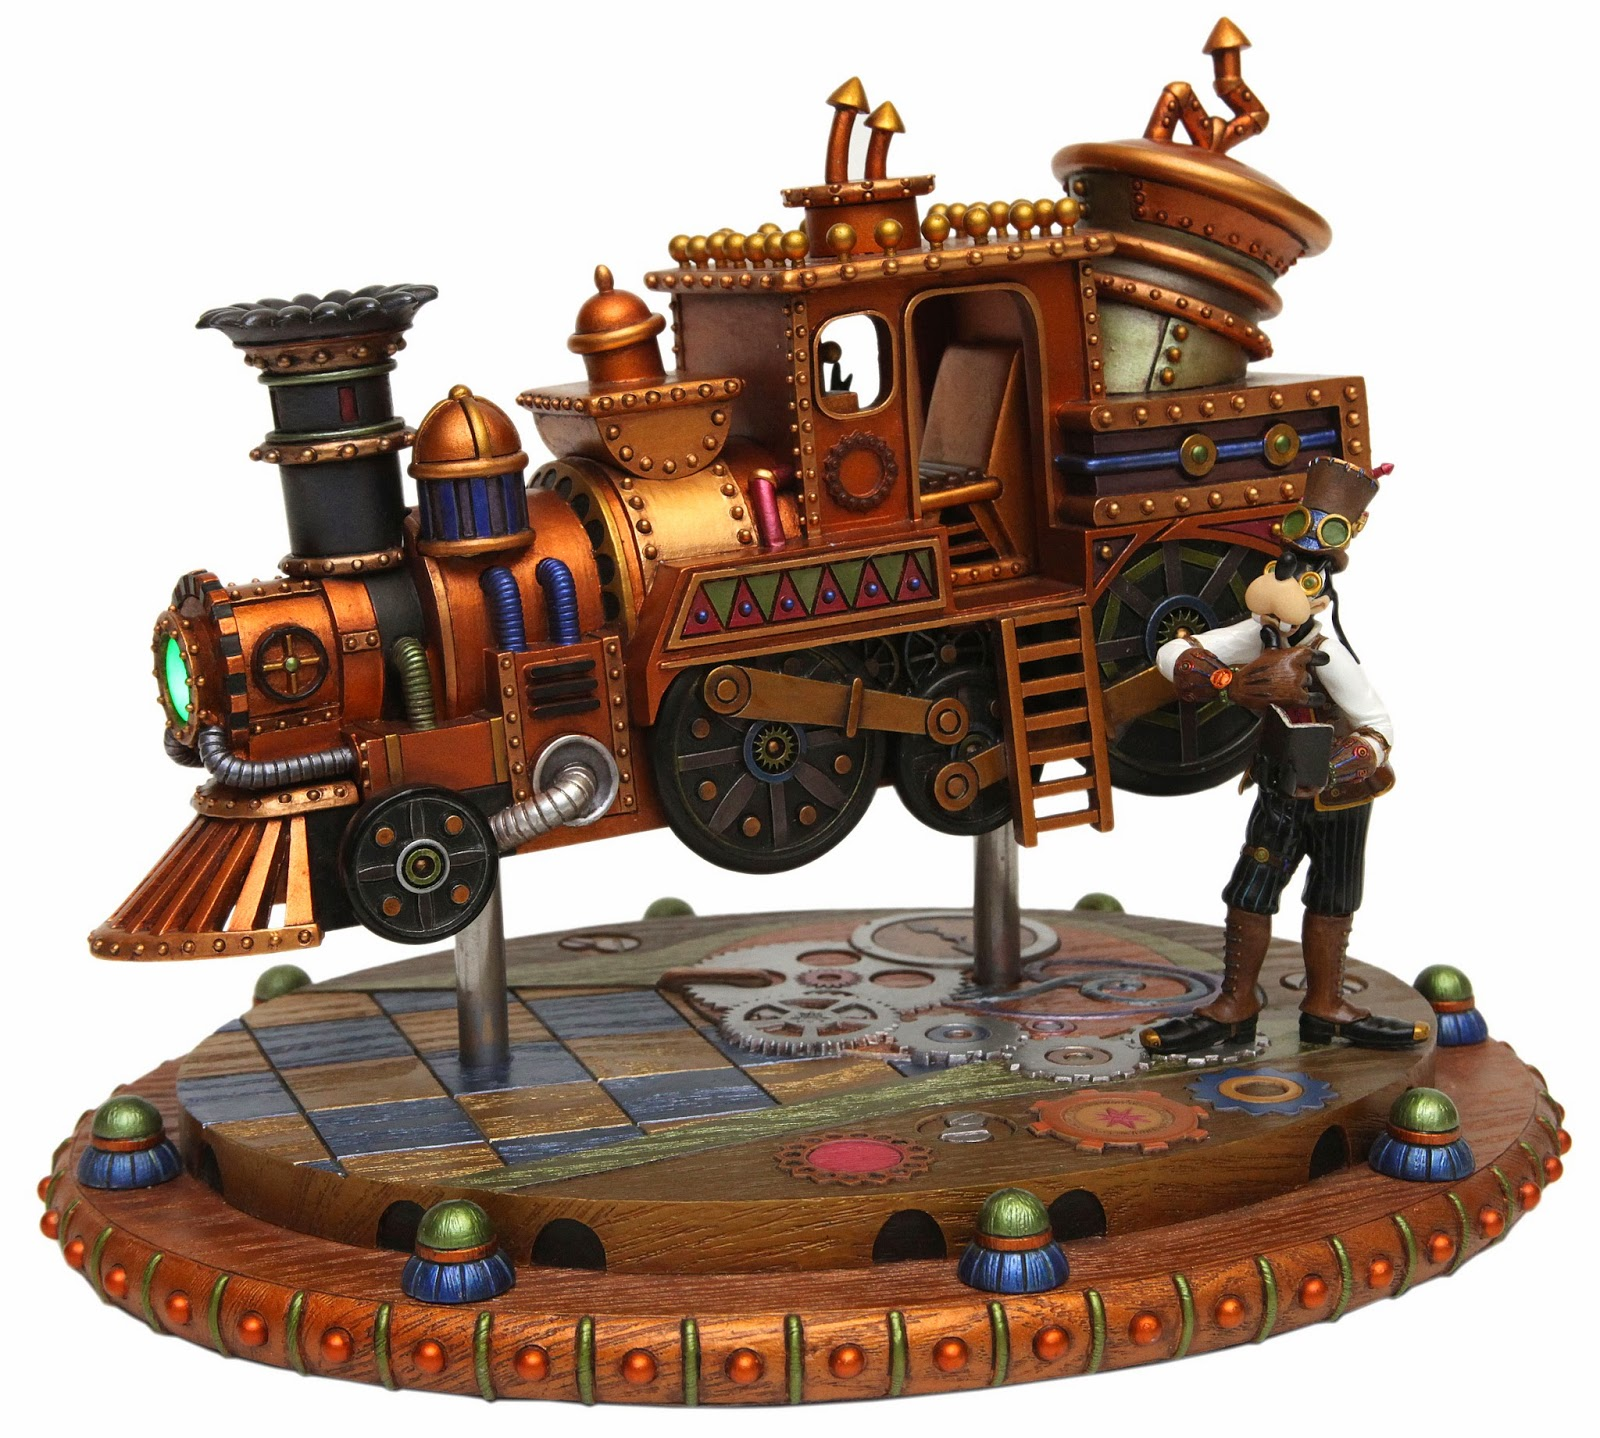 Goofy Train Mechanical Kingdom Figure Figurine Statue gears steampunk Walt Disney World WDW Disneyland